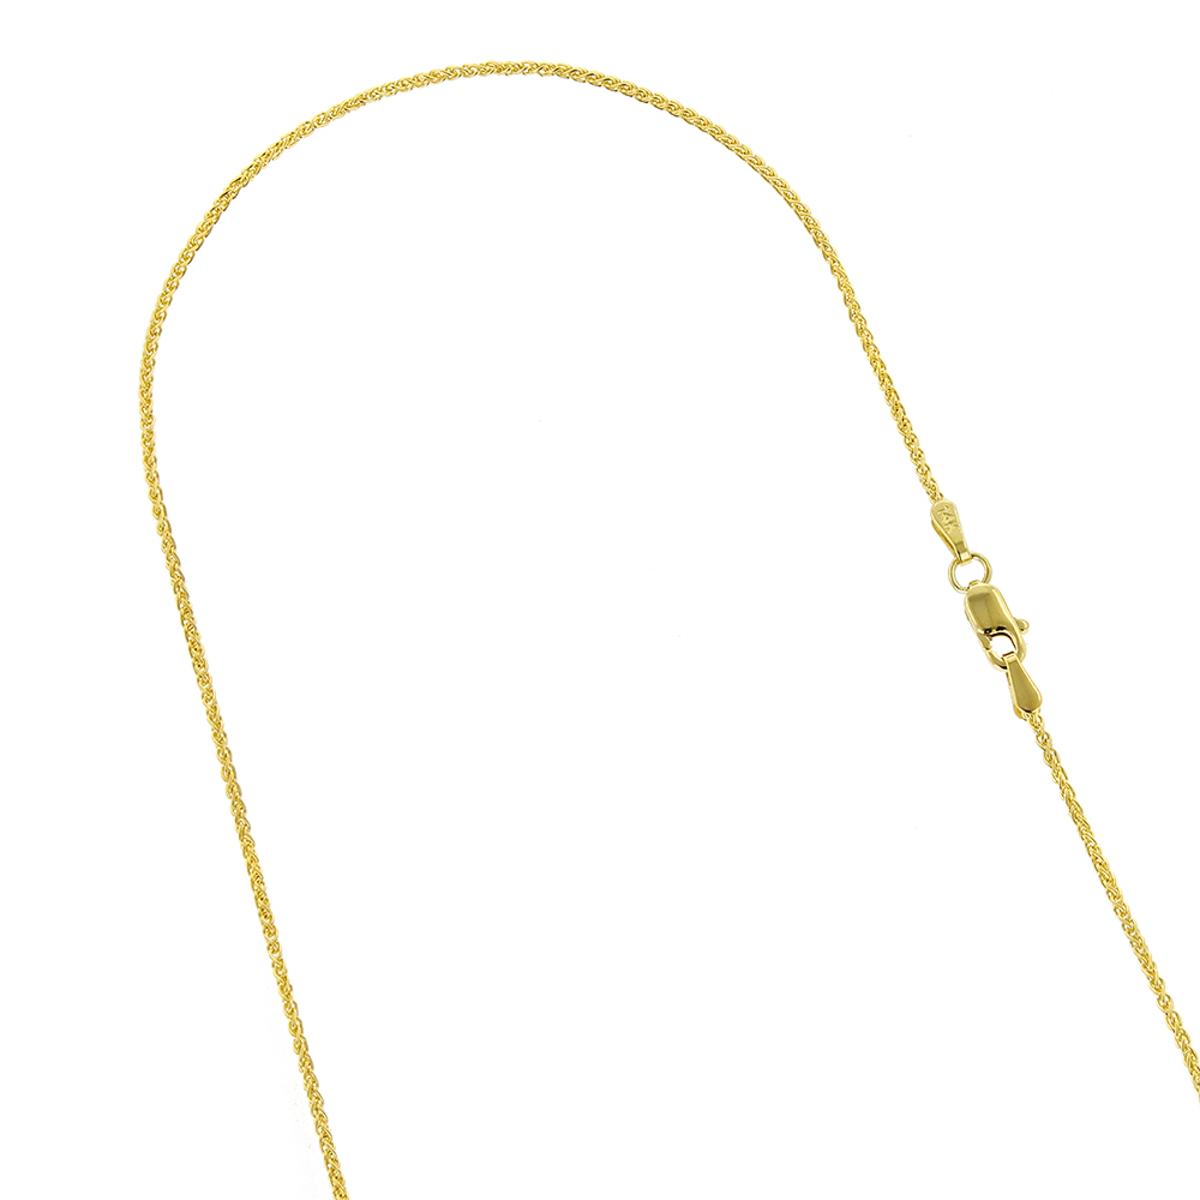 LUXURMAN Solid 10k Gold Wheat Chain For Women 1mm Wide